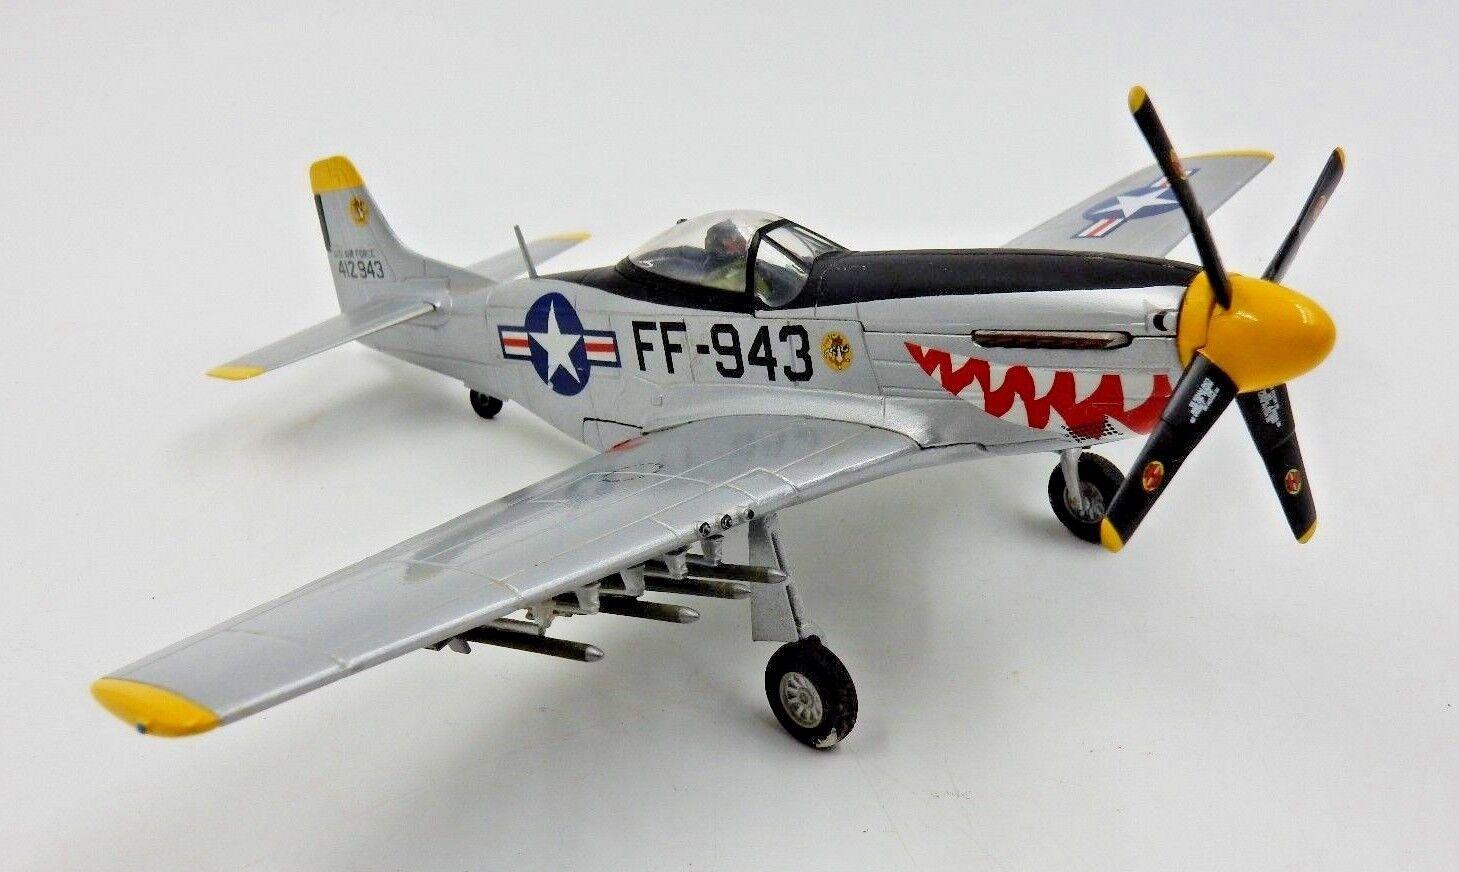 CORGI NORTH NORTH NORTH AMERICAN F-51D MUSTANG 44-12943 FF-943  LIMITED EDITION 1200 MADE 98322e